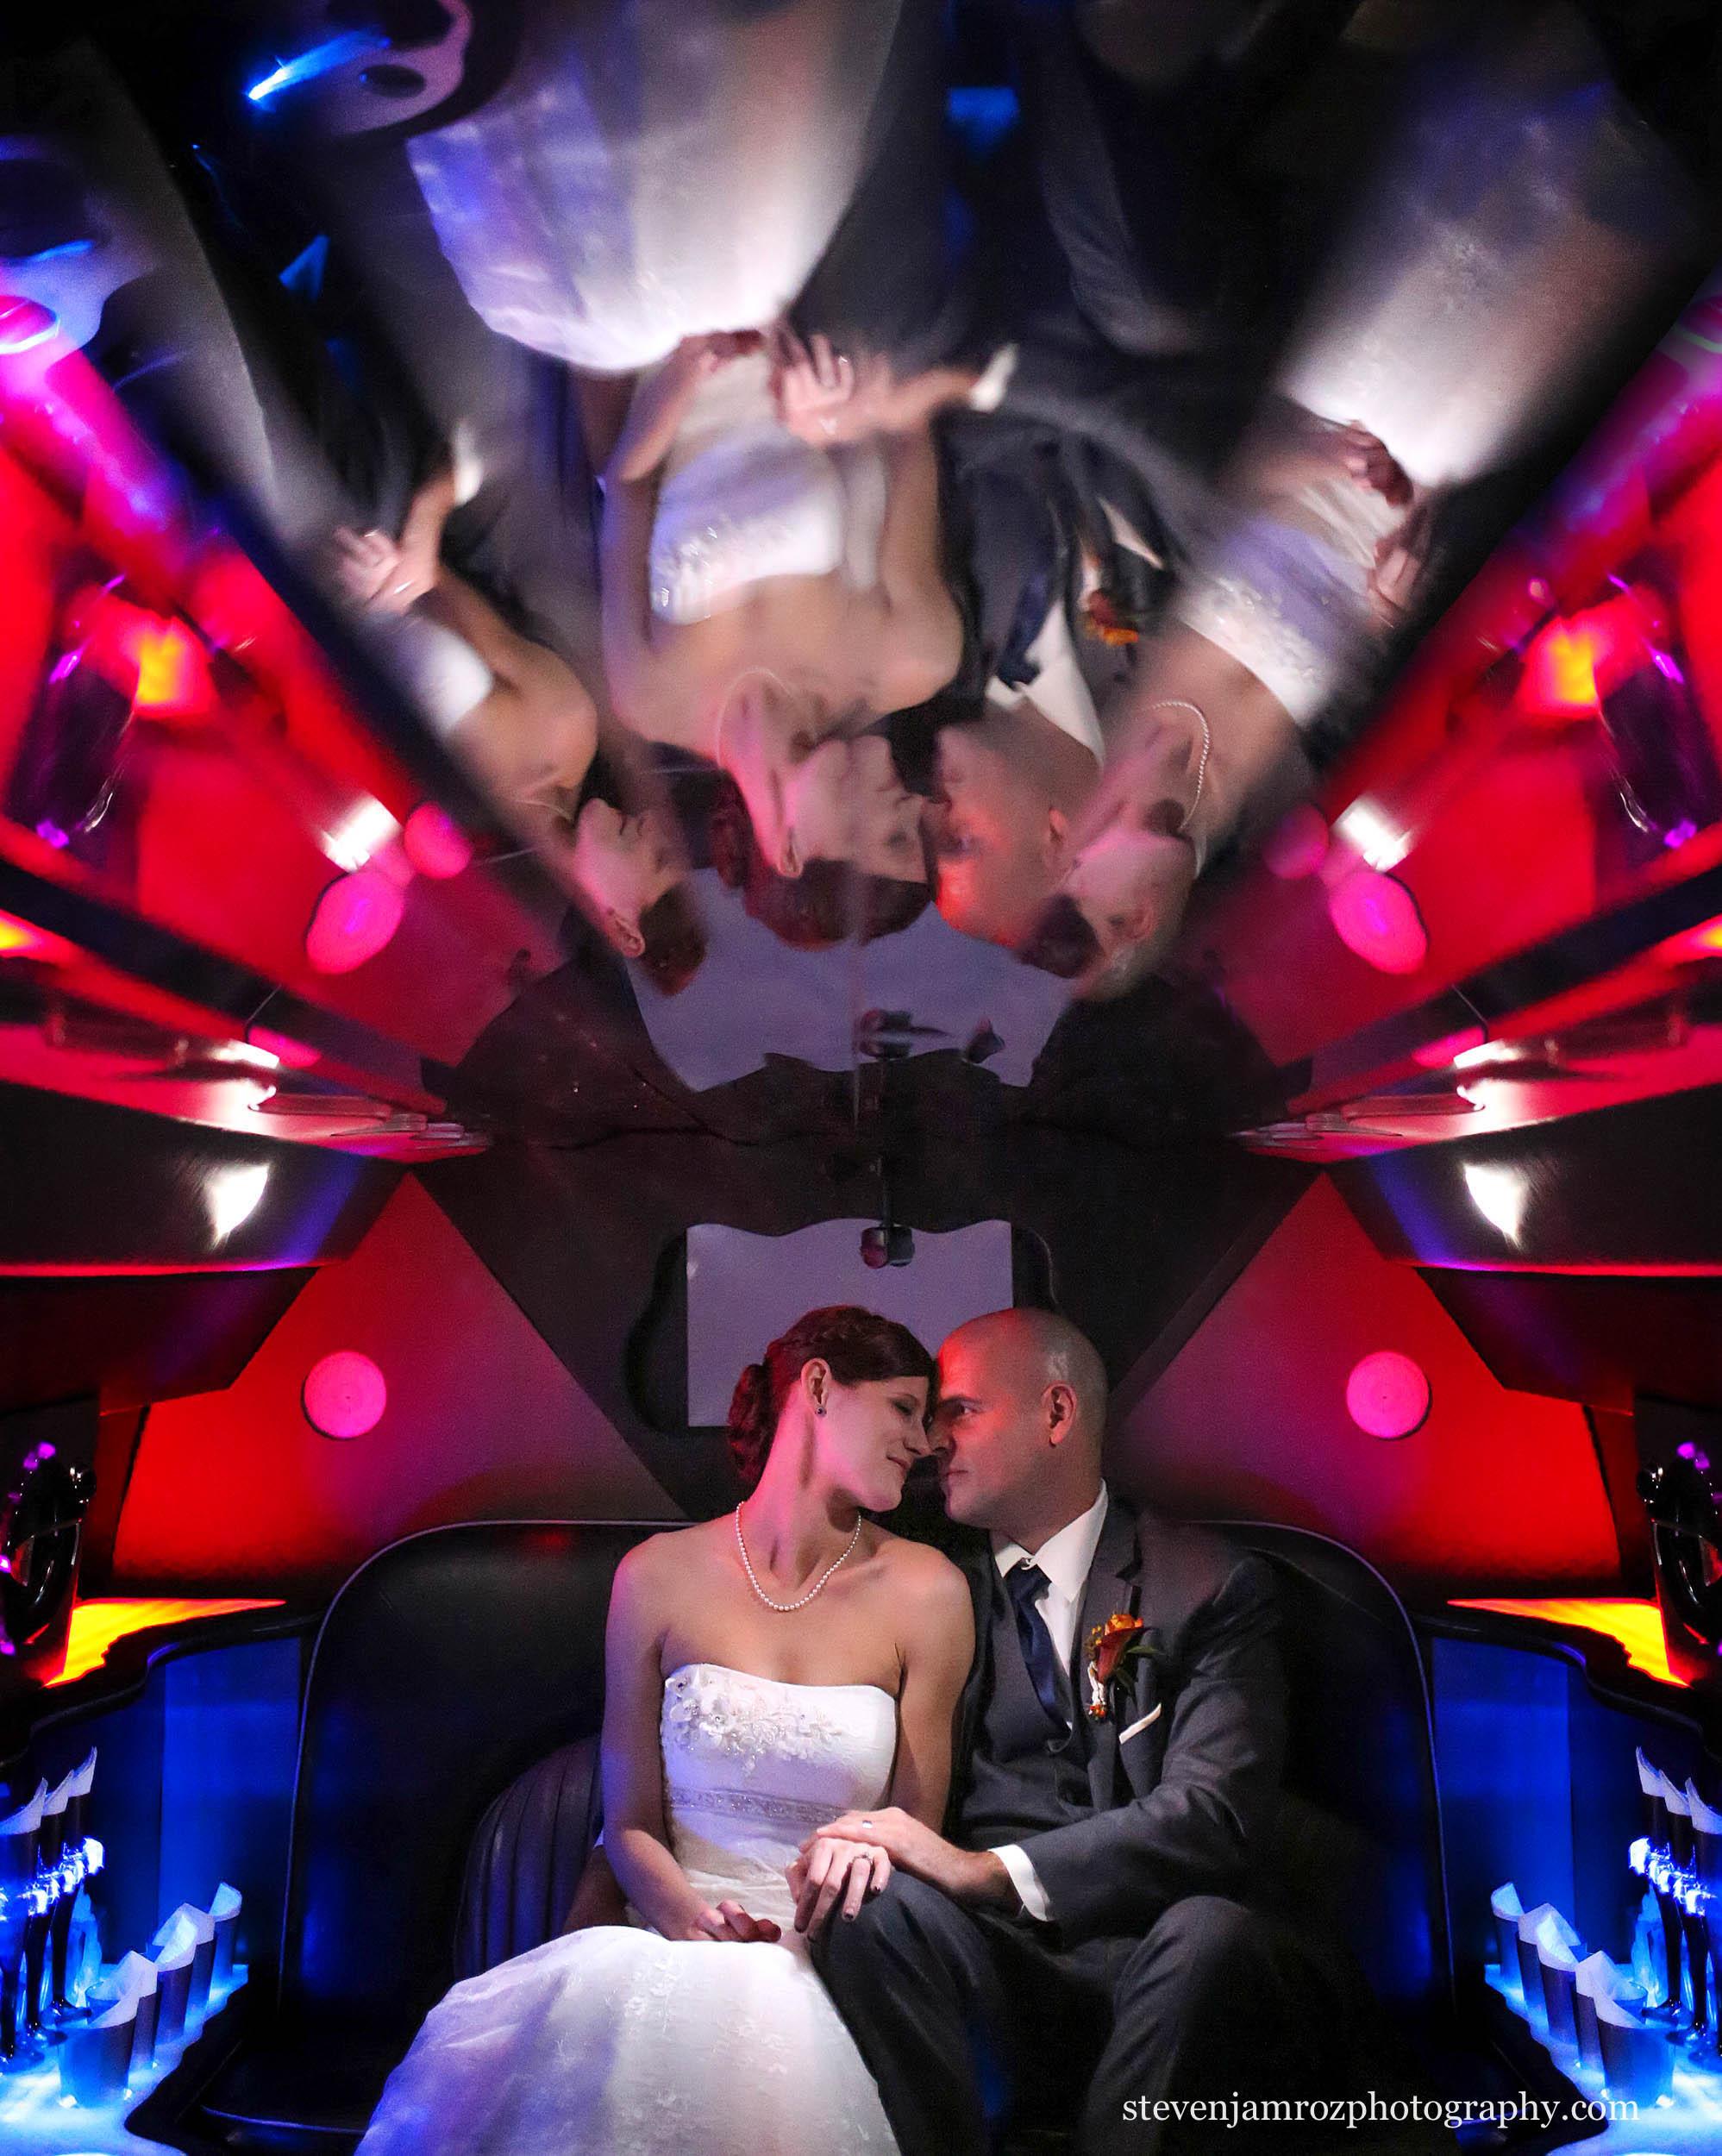 limo-ride-after-wedding-hudson-manor-steven-jamroz-photography-0588.jpg